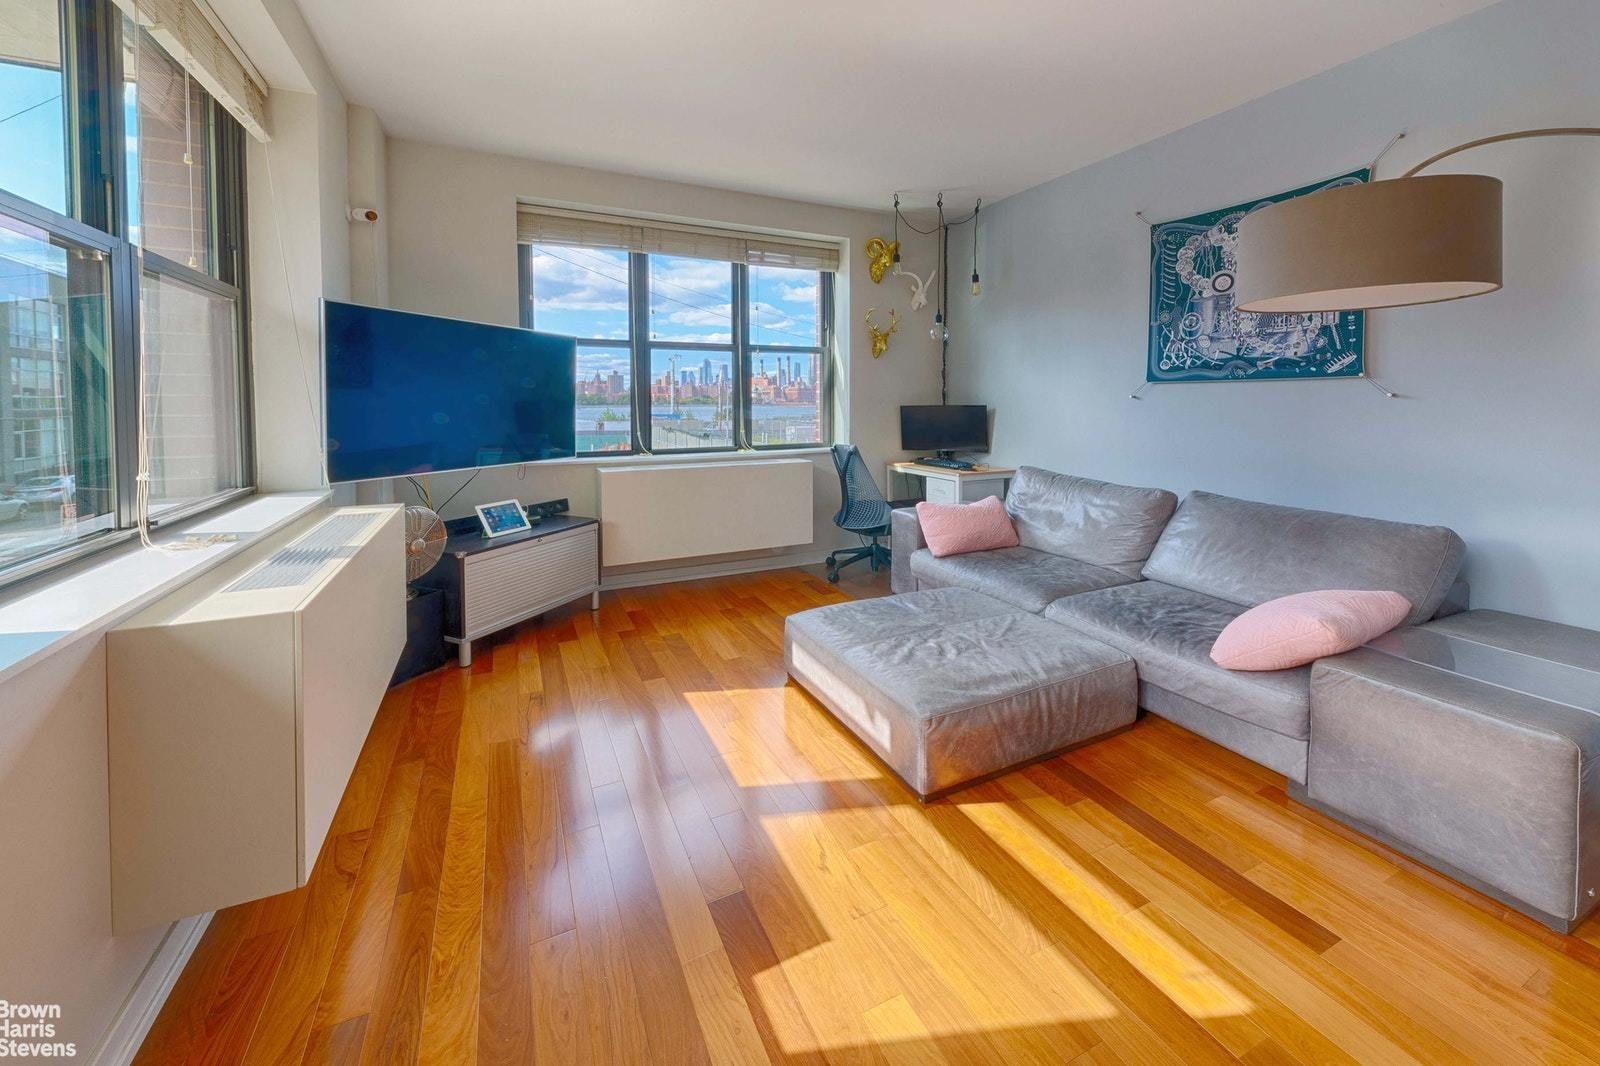 Apartment for sale at 58 Metropolitan Avenue, Apt 2H